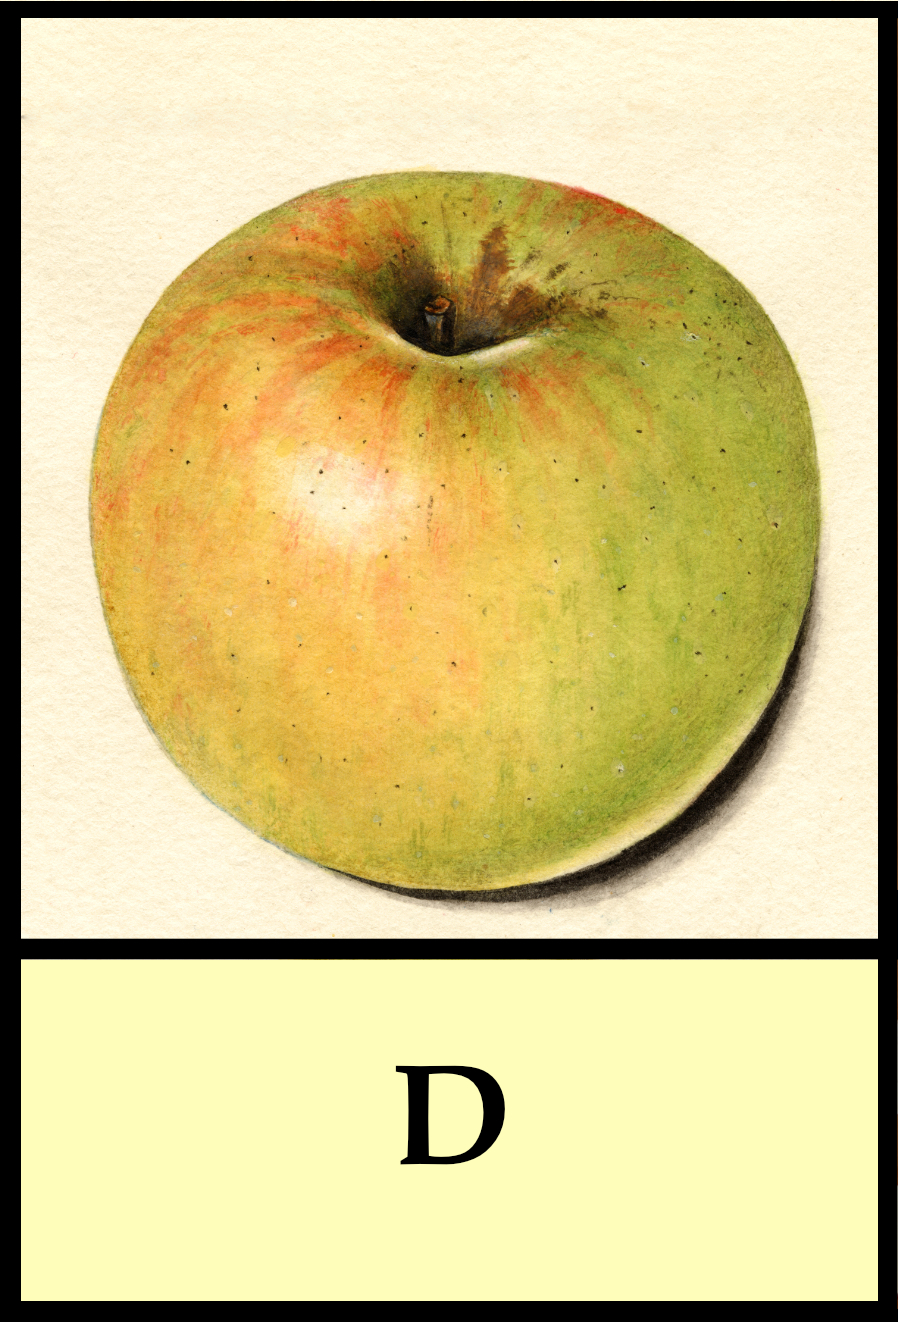 D apples